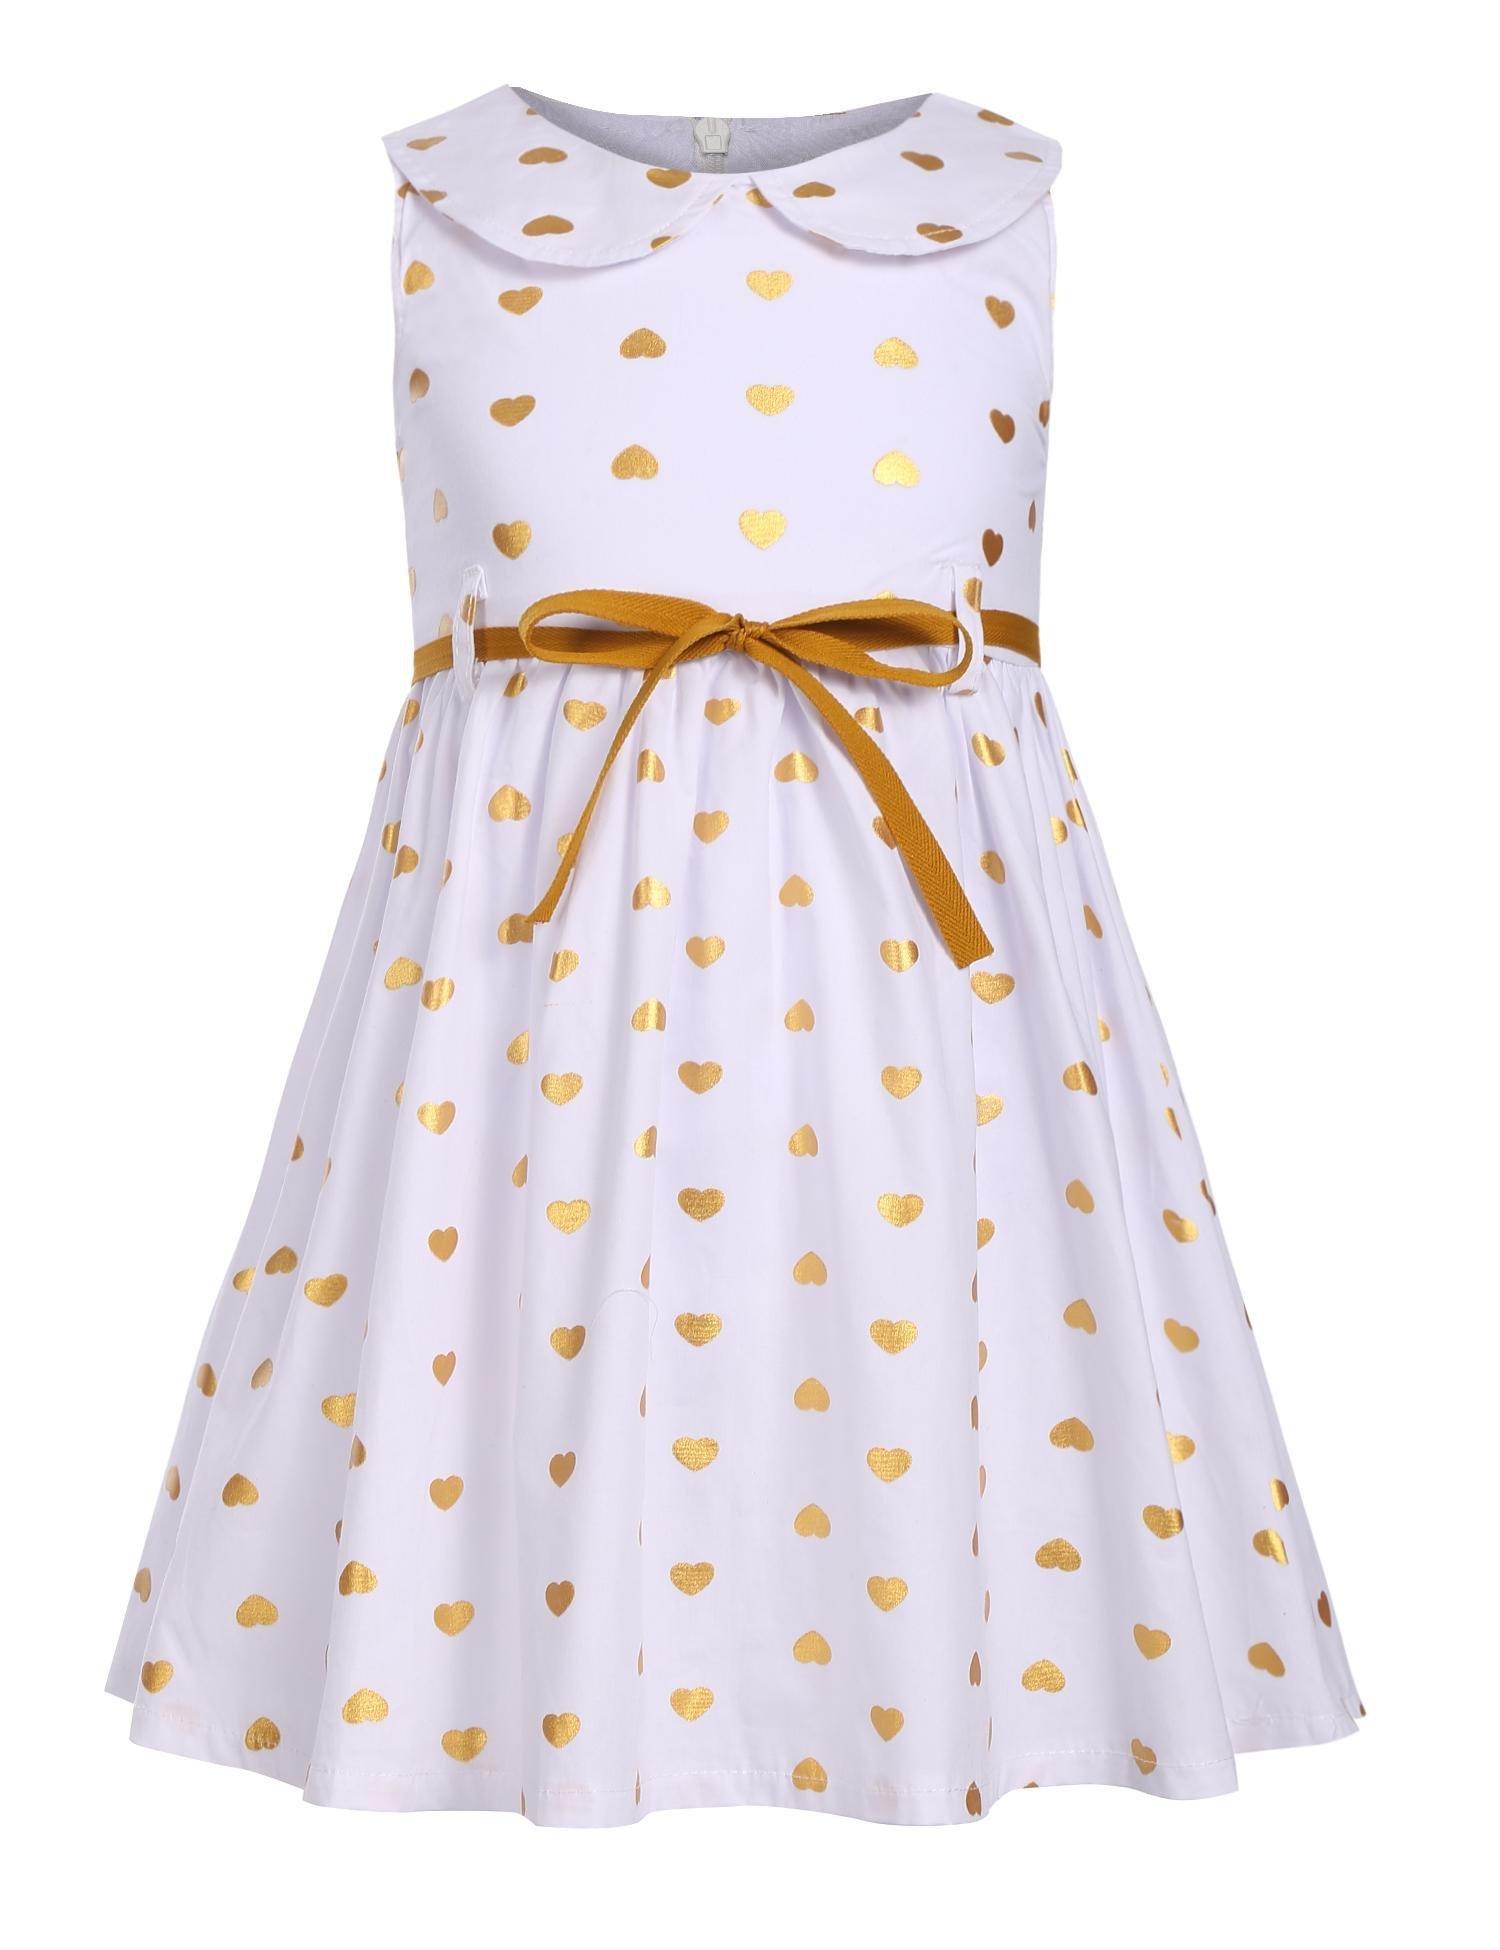 Arshiner Girls Sleeveless Doll Collar Dress Vintage Polka Dot Swing Peter Pan Collar Dress With Belt